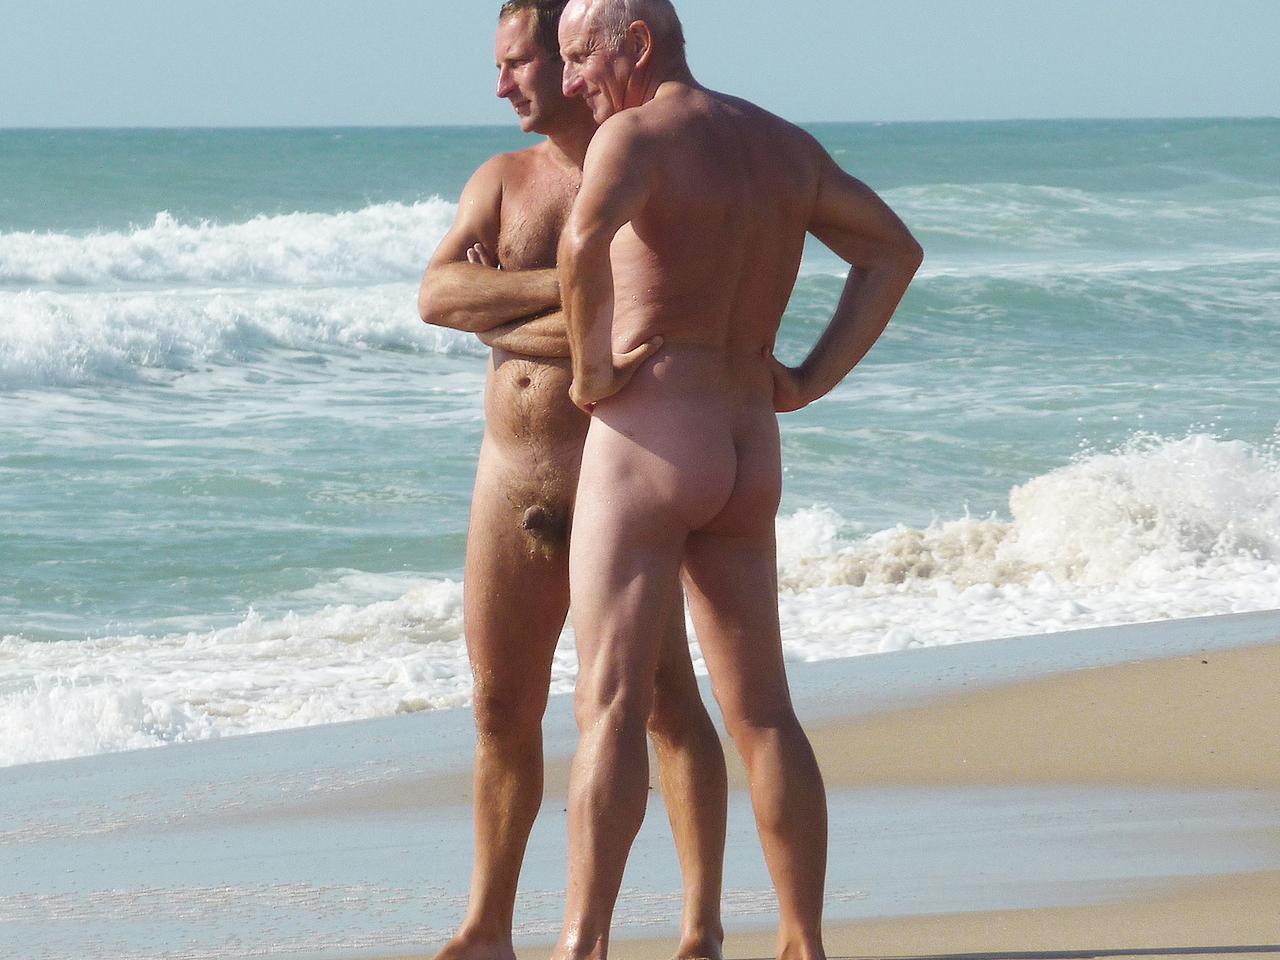 sexy girls bums bent over in underwear